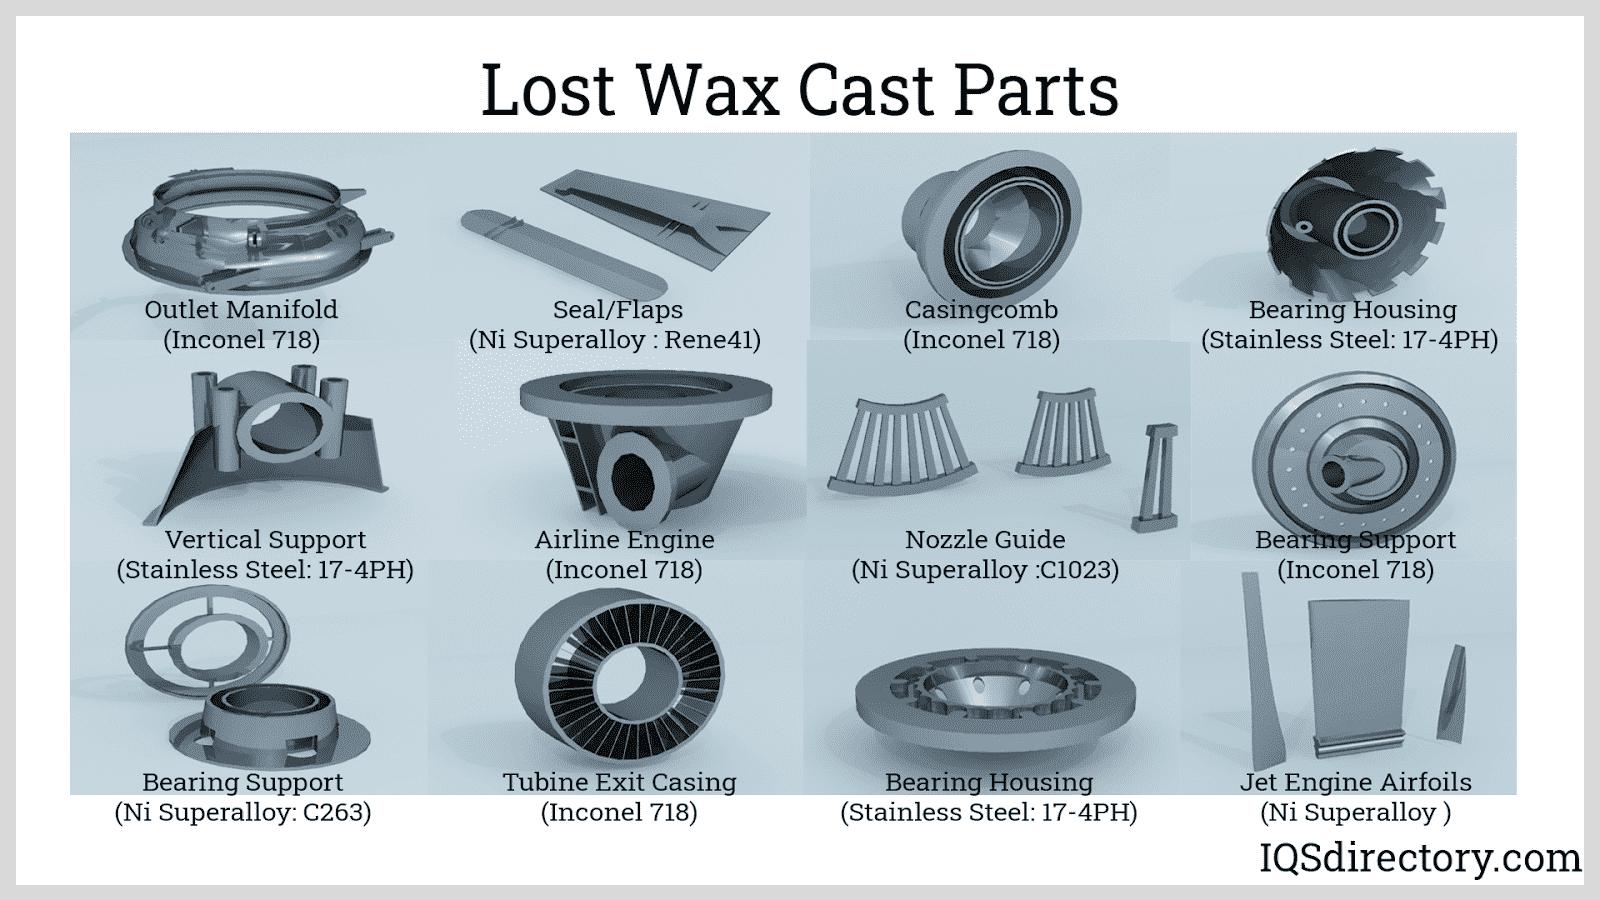 Lost Wax Cast Parts